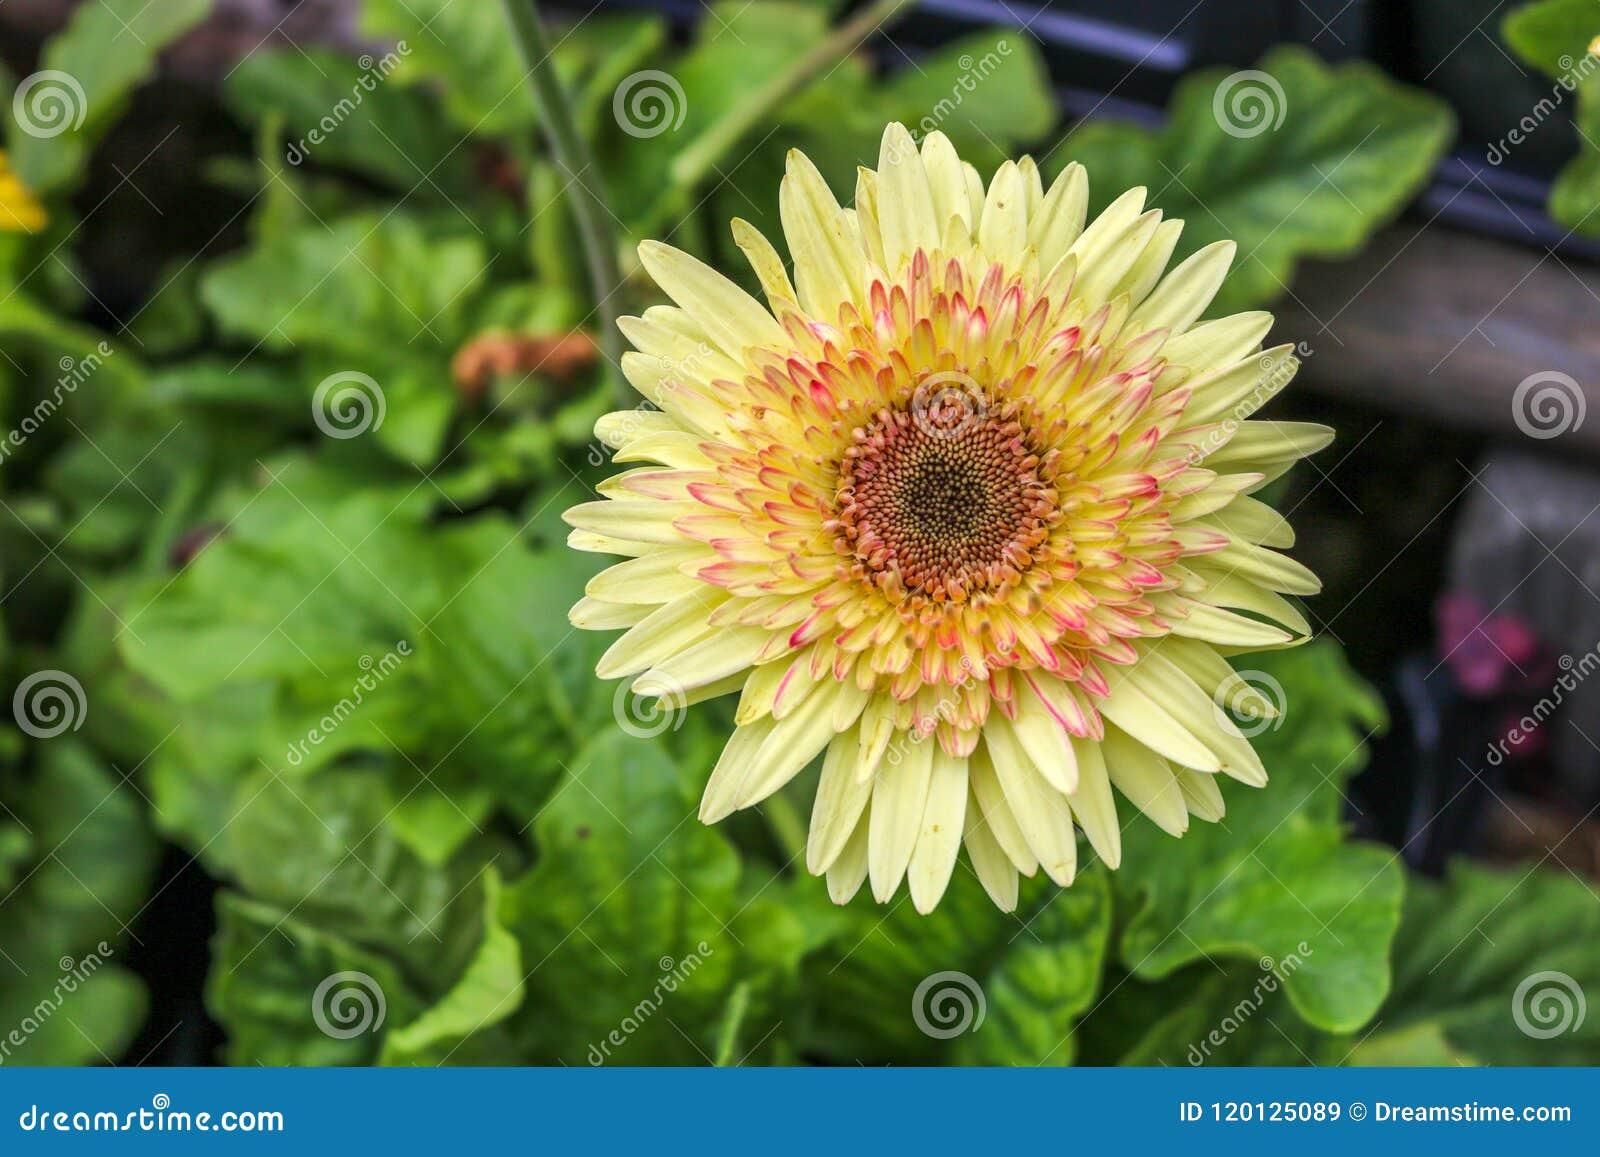 Yellow big flower stock image image of leaves summer 120125089 yellow big flower mightylinksfo